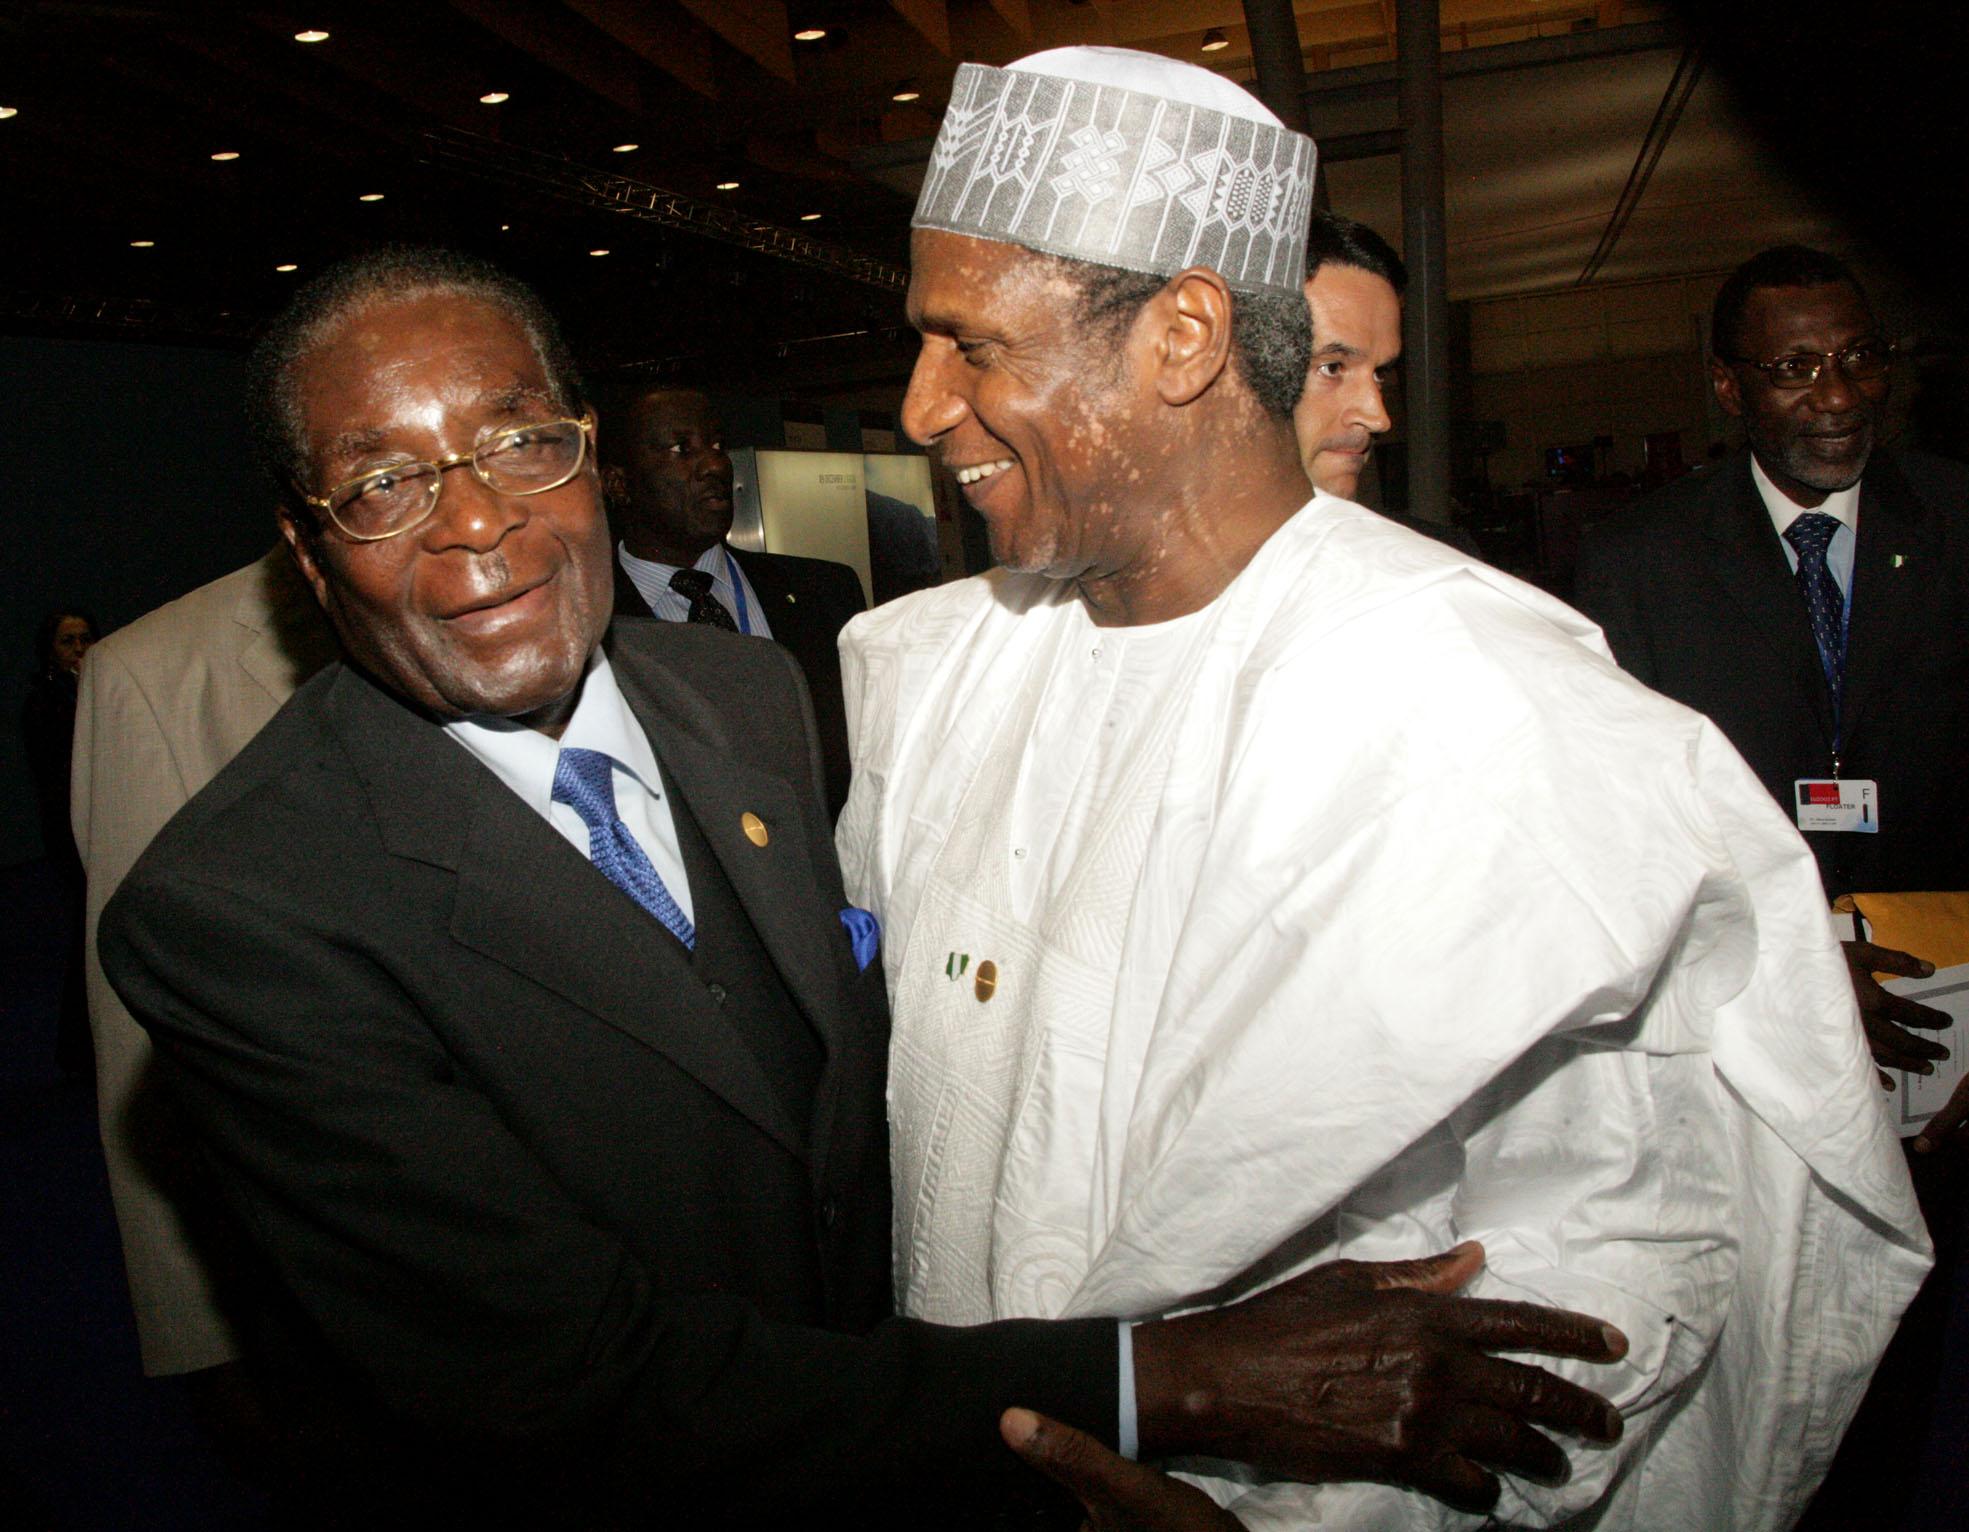 Zimbabweanization of Nigeria?